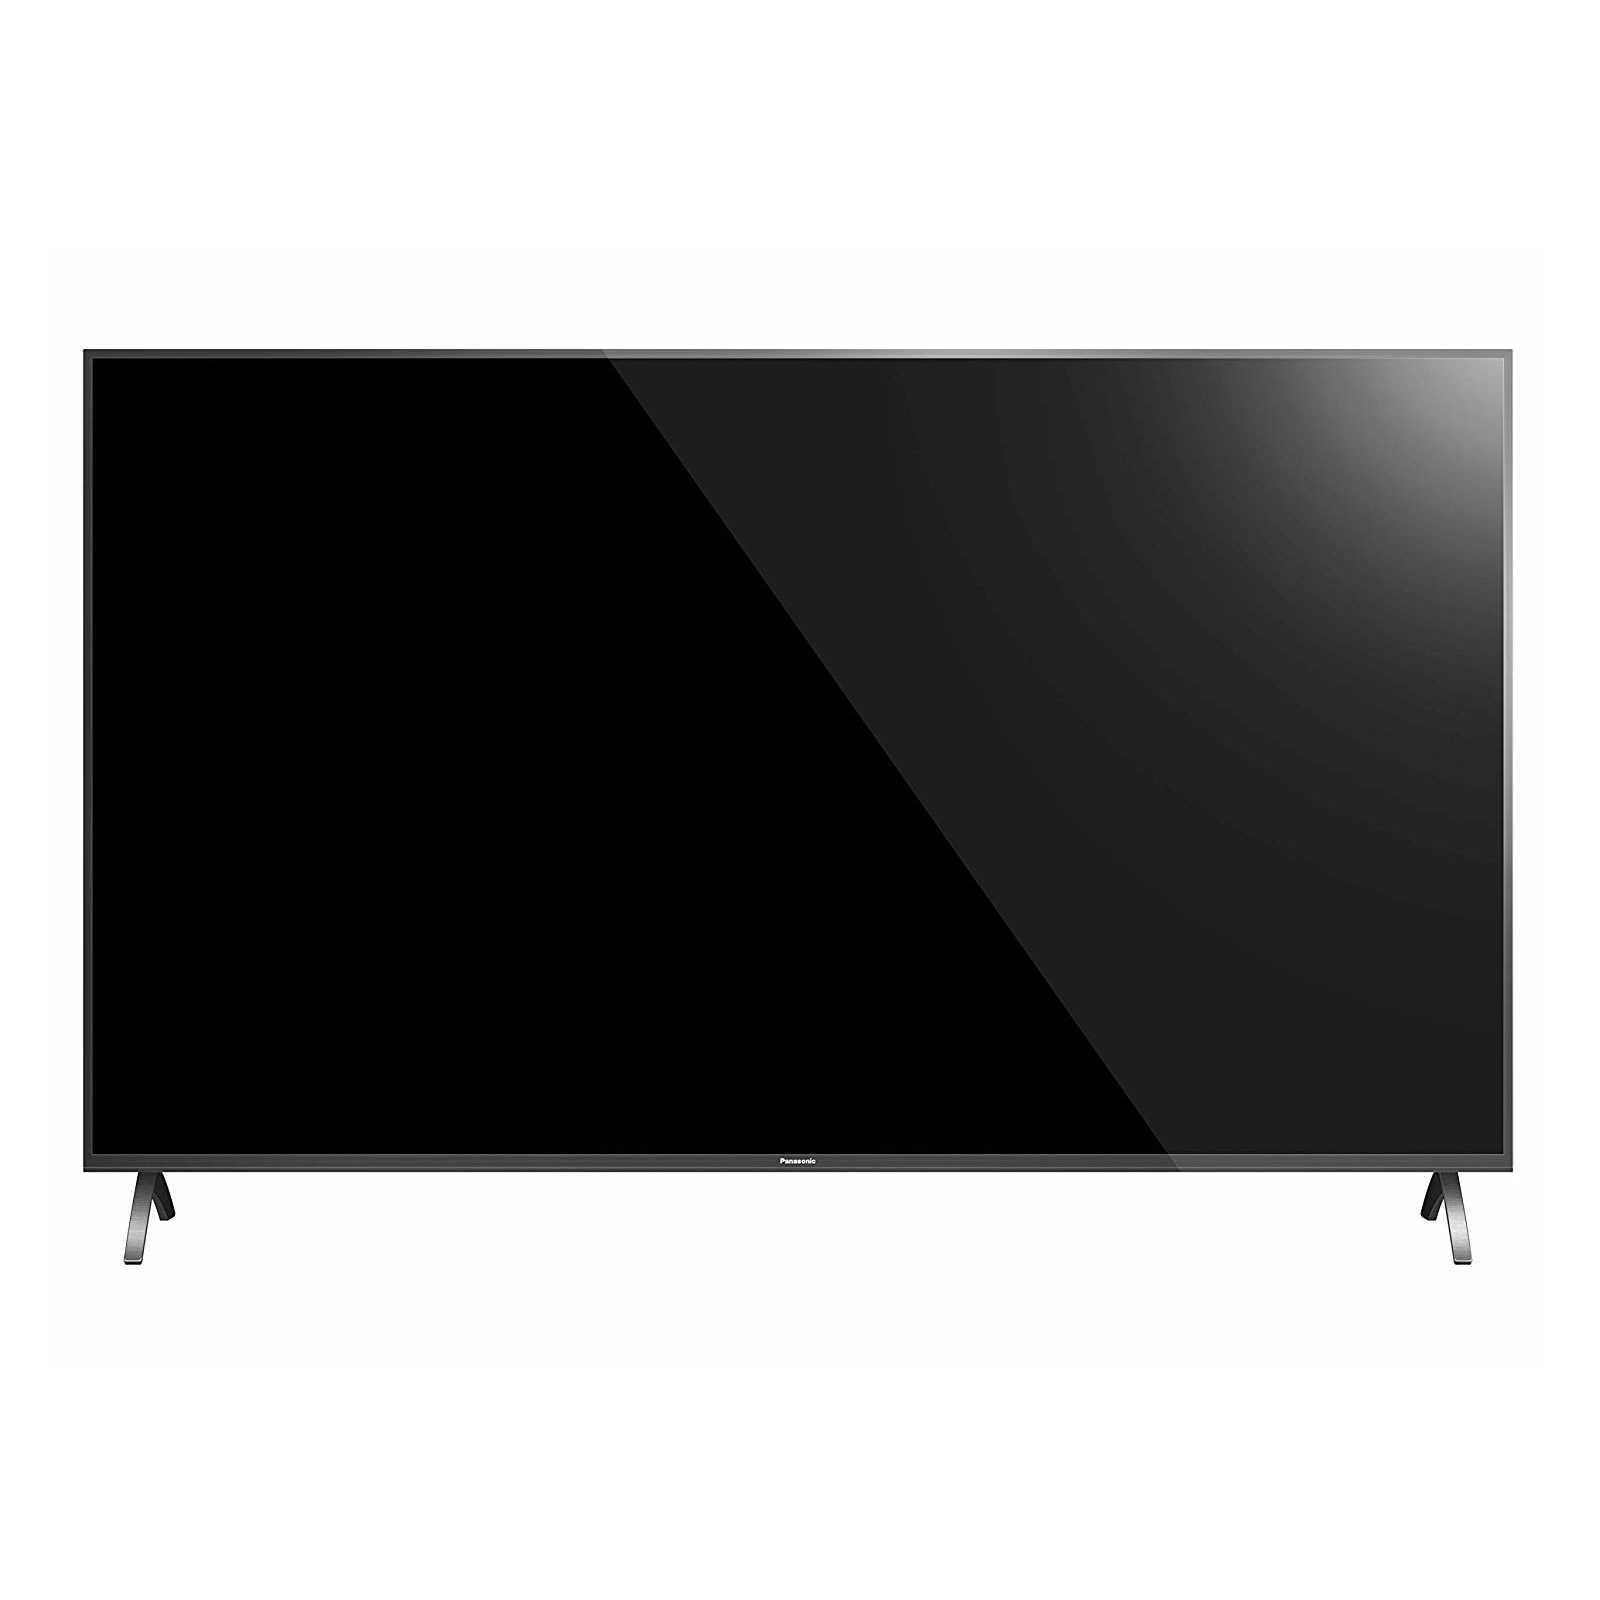 Panasonic TH-65GX800D 65 Inch 4K Ultra HD LED Television